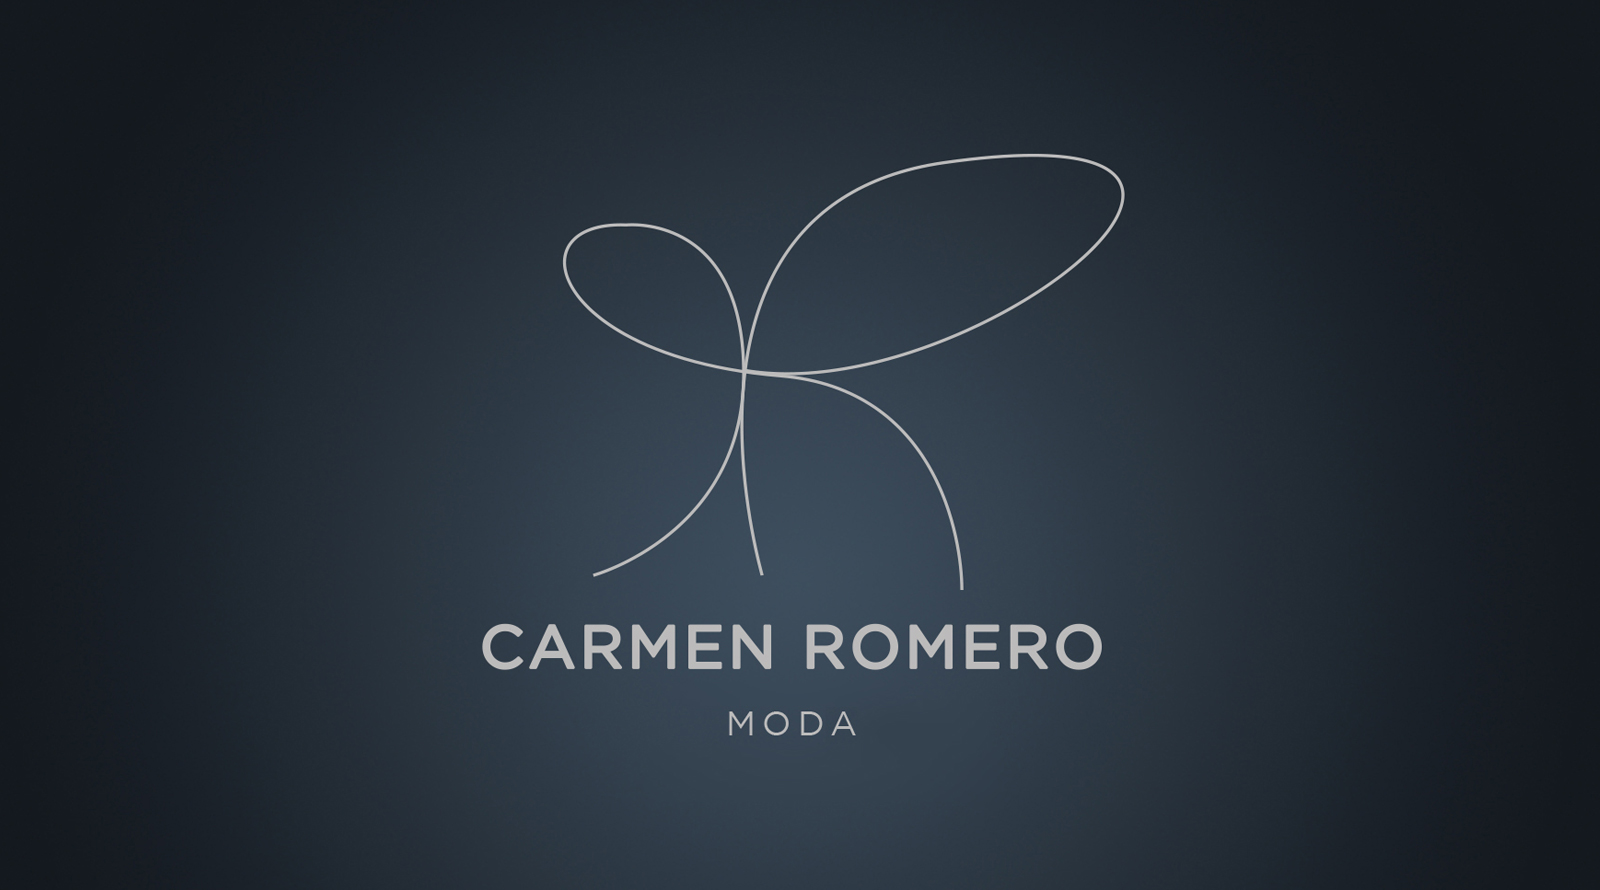 Imagen_negativo_carmen_romero